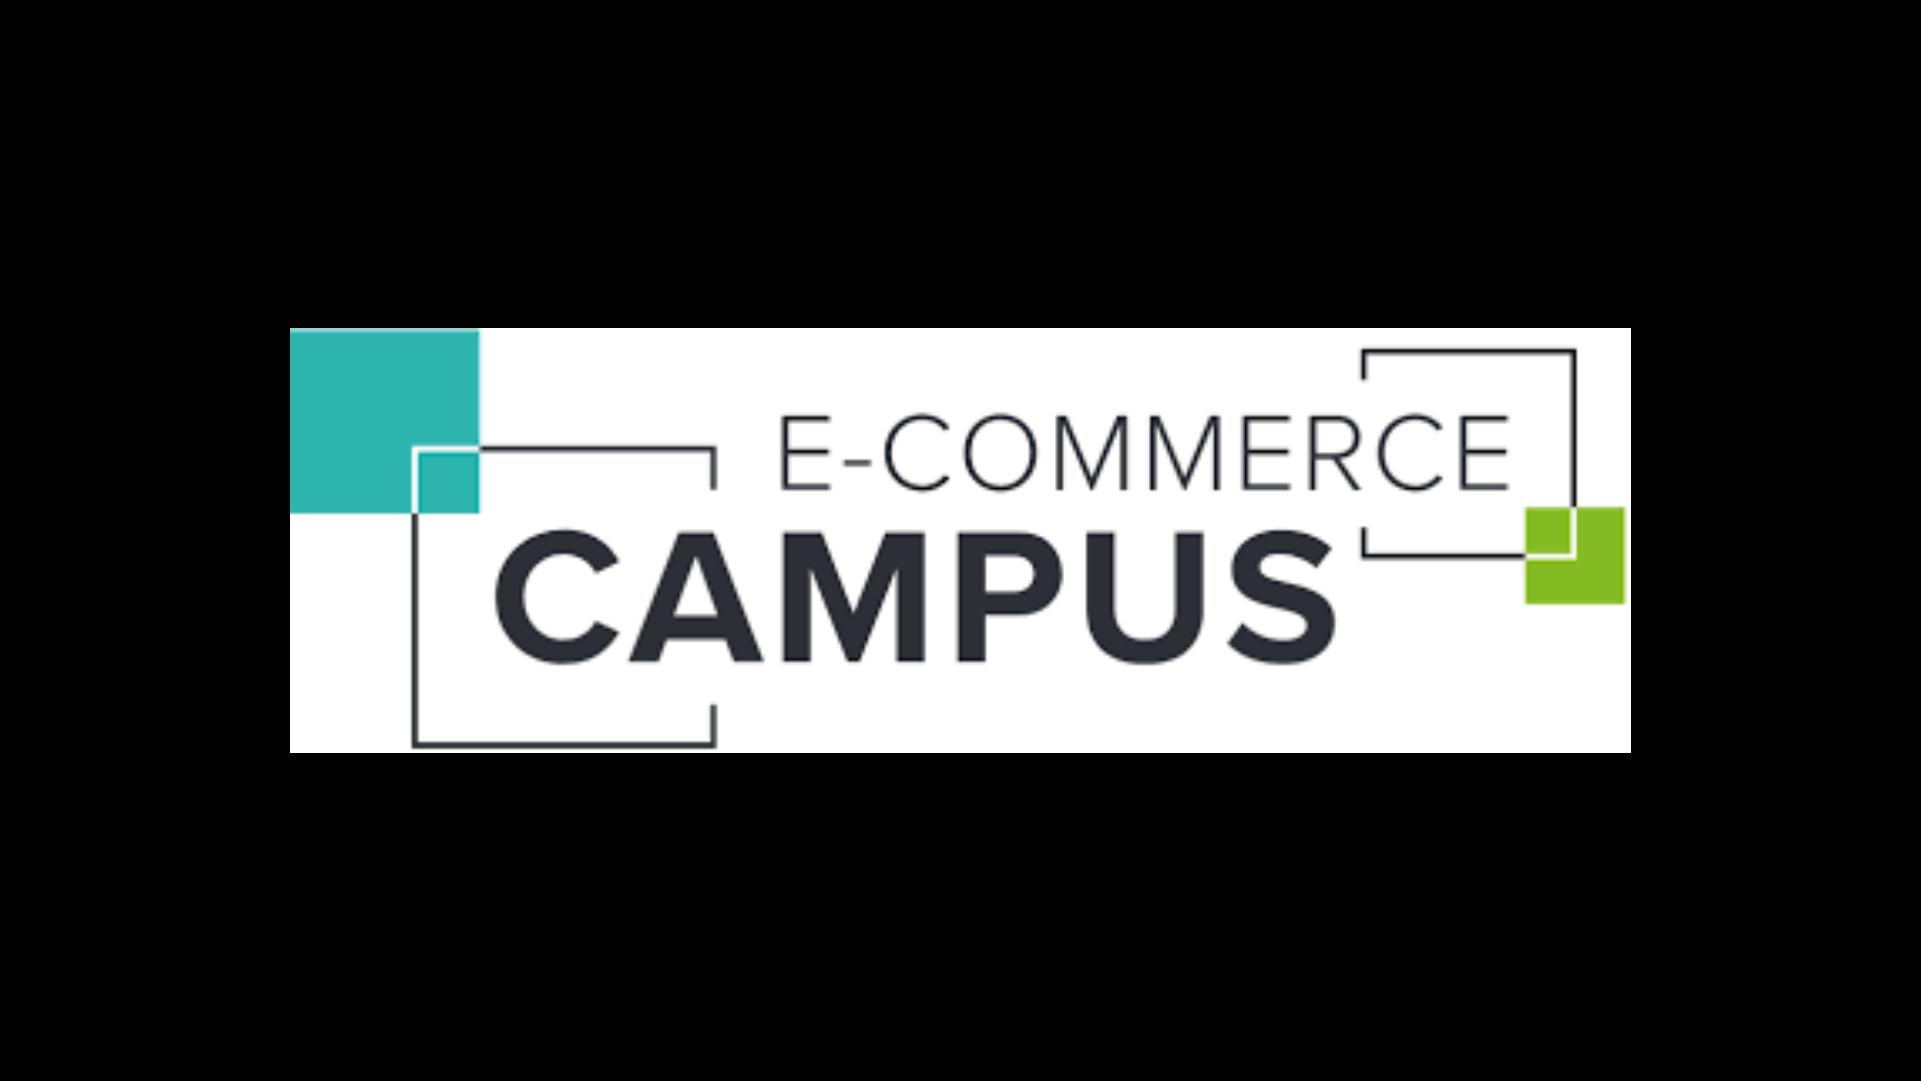 Logo E-Commerce Campus